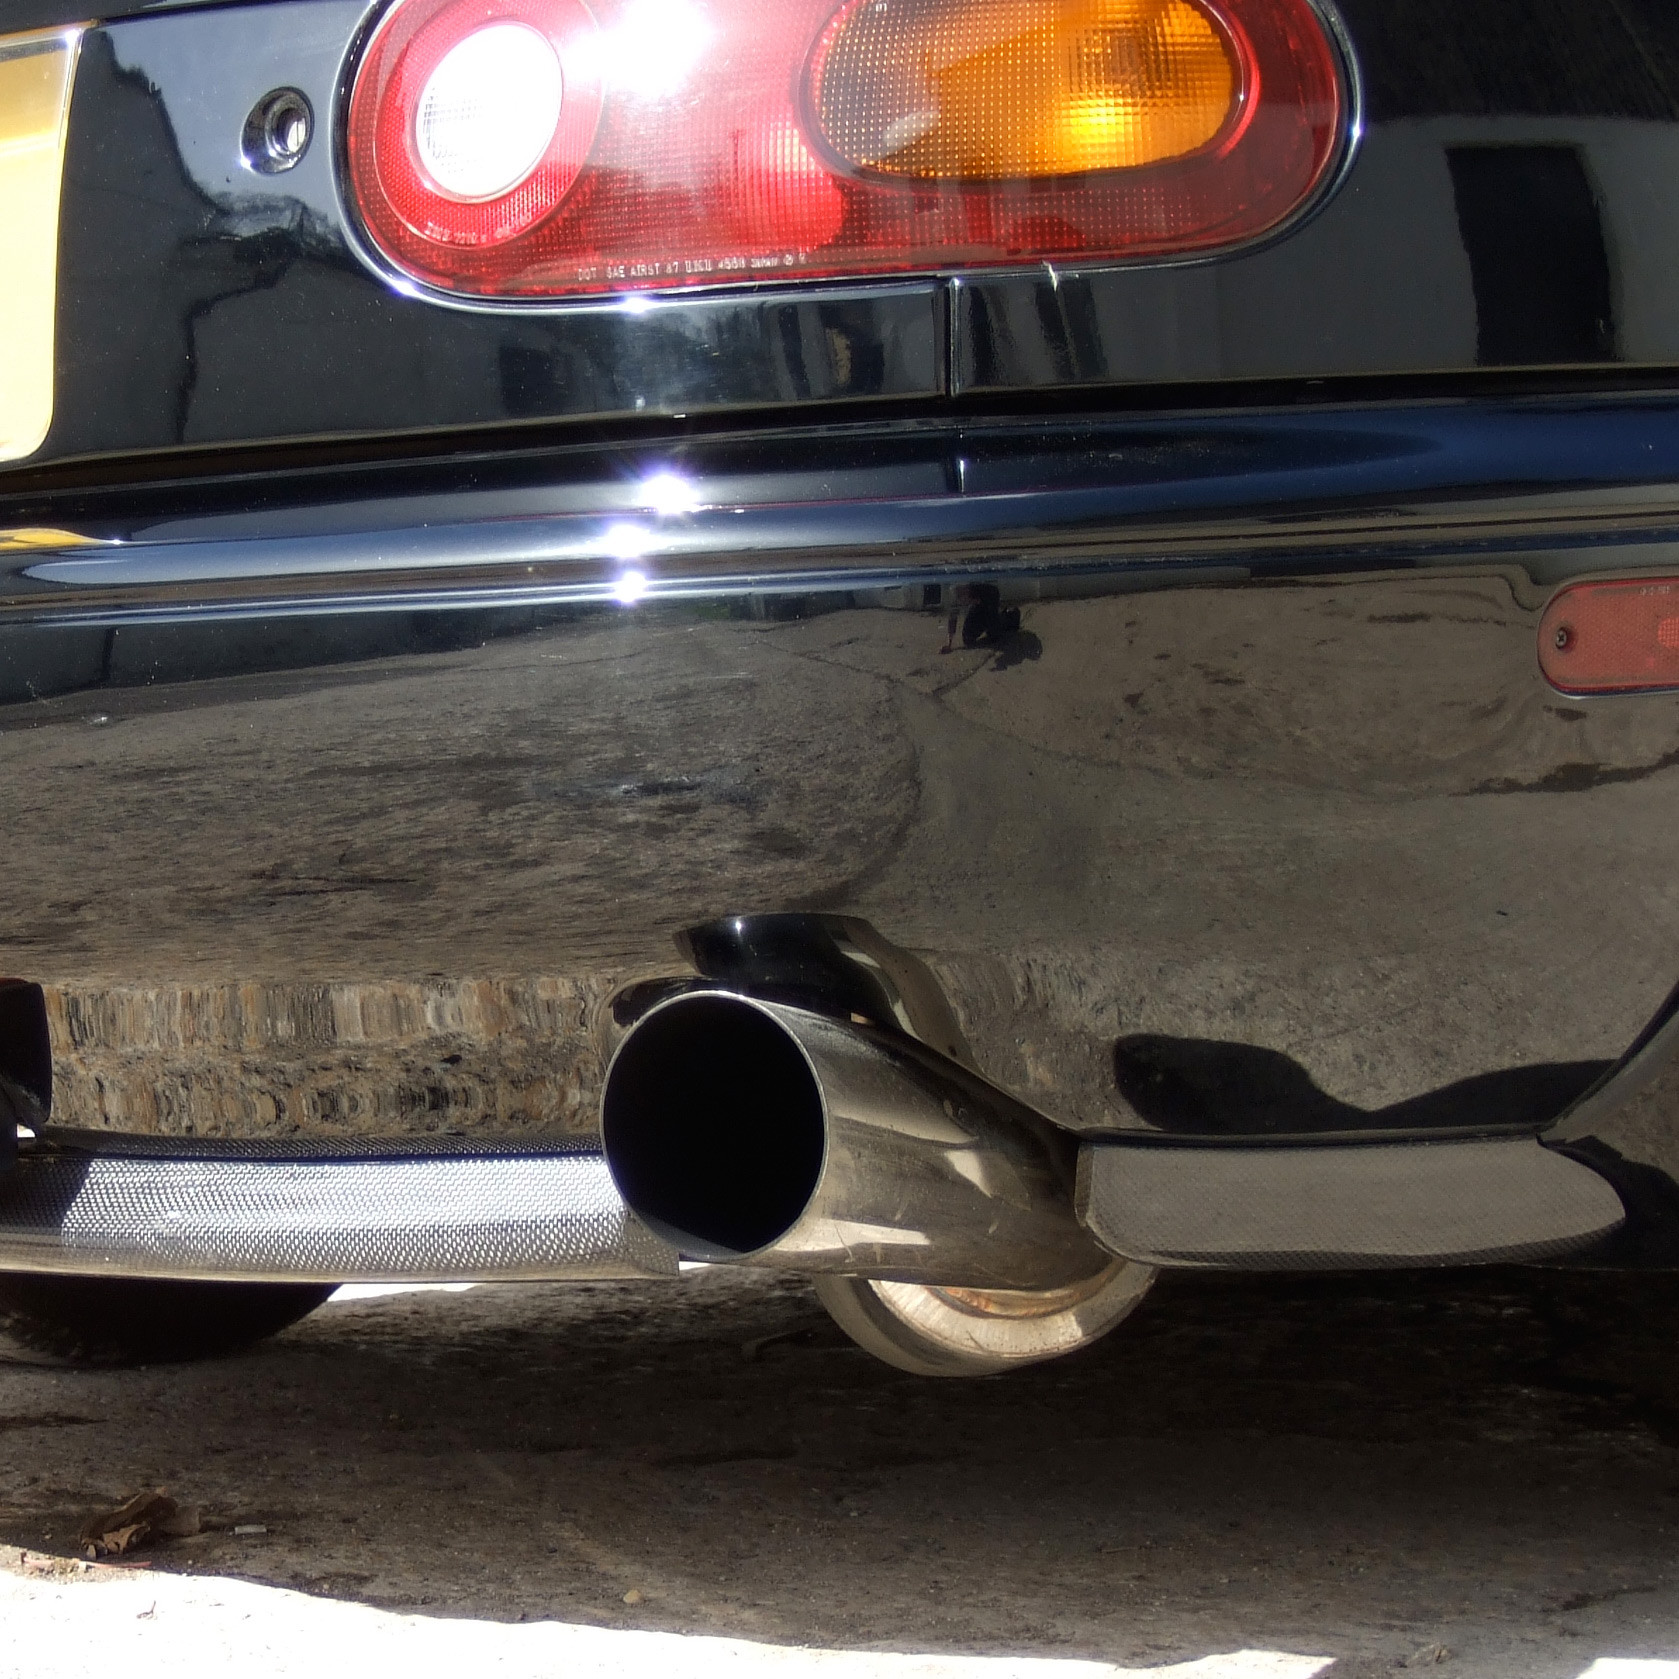 REV9 OE-Style Rear Lip For Miata MX5 MX-5 89-97 JDM Roadster : REV9 Autosport